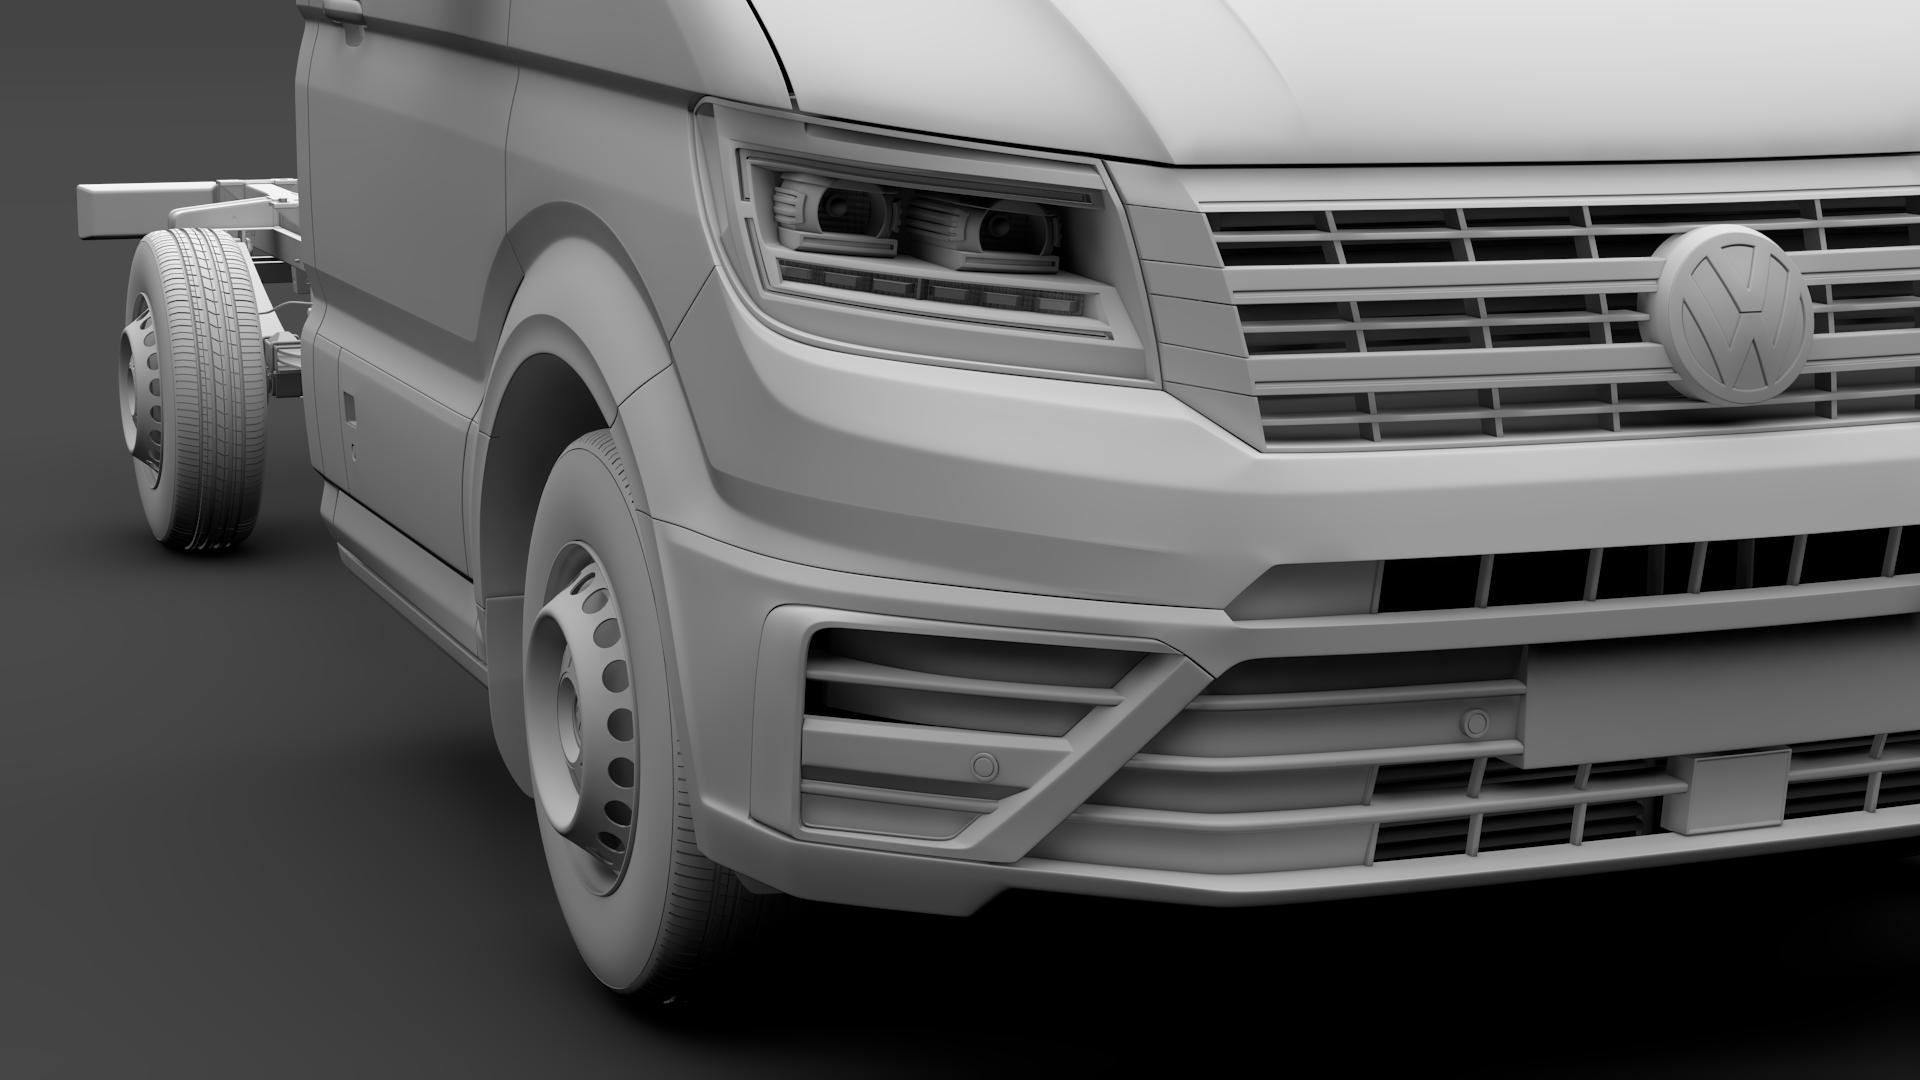 wv crafter chassis single-cab 2017 3d model max fbx c4d lwo ma mb hrc xsi obj 275105